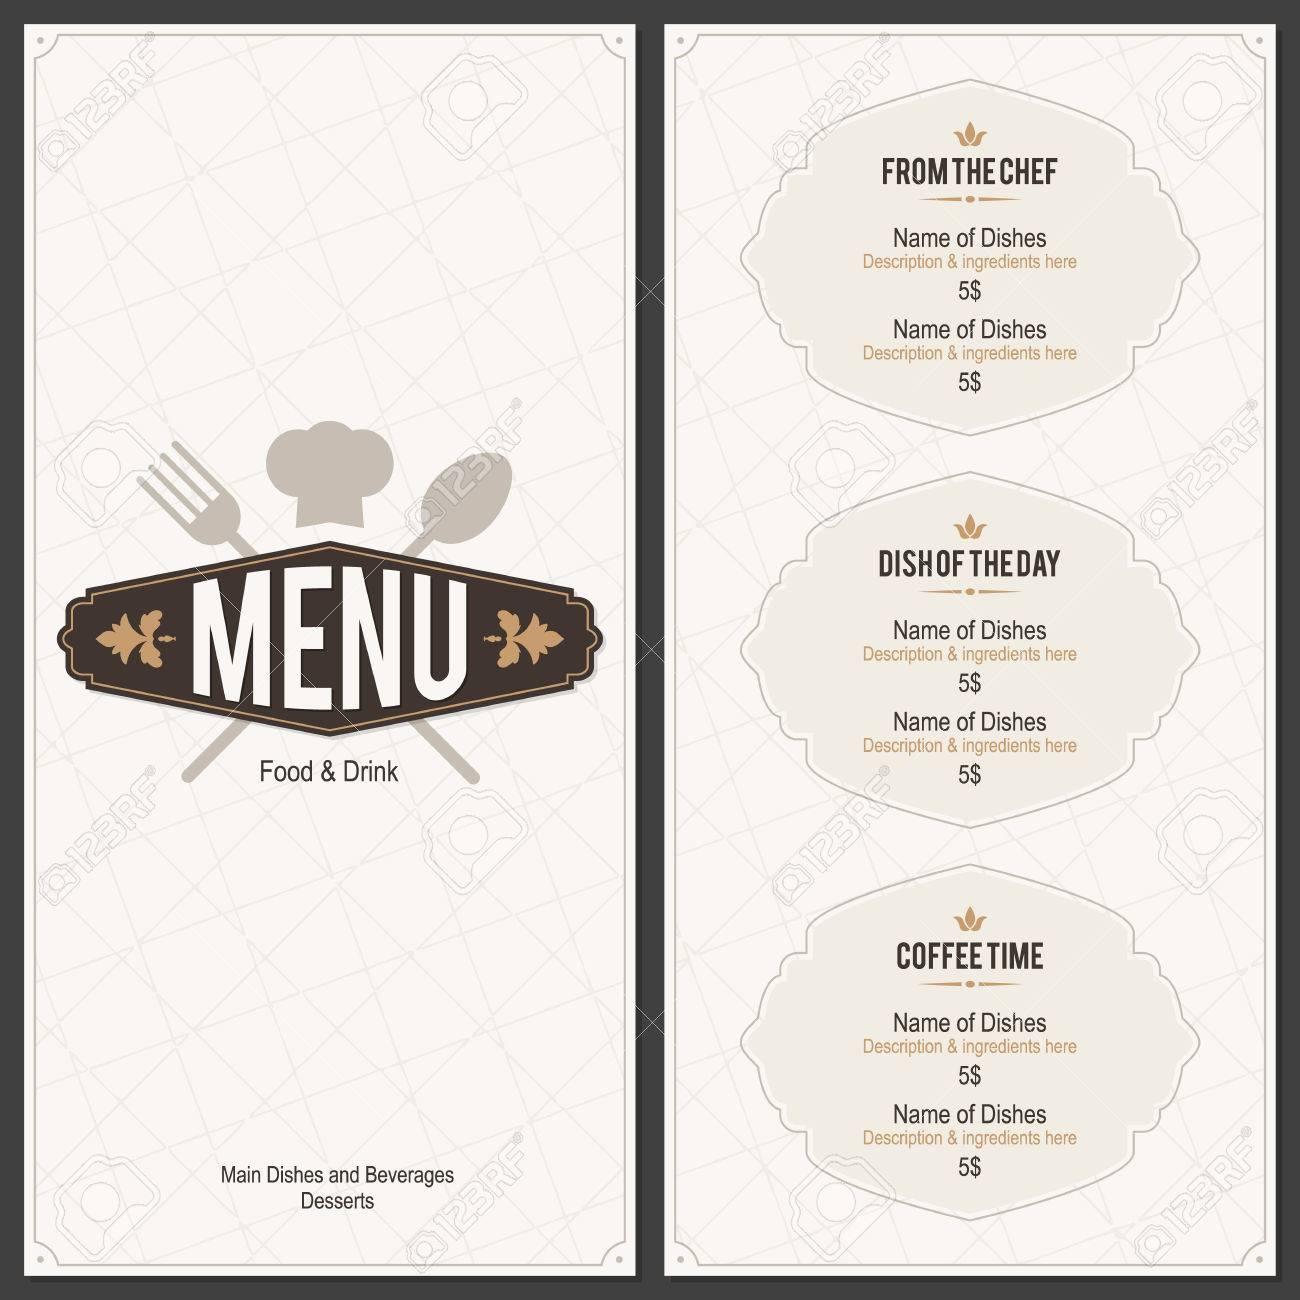 Restaurant menu design - 37726663